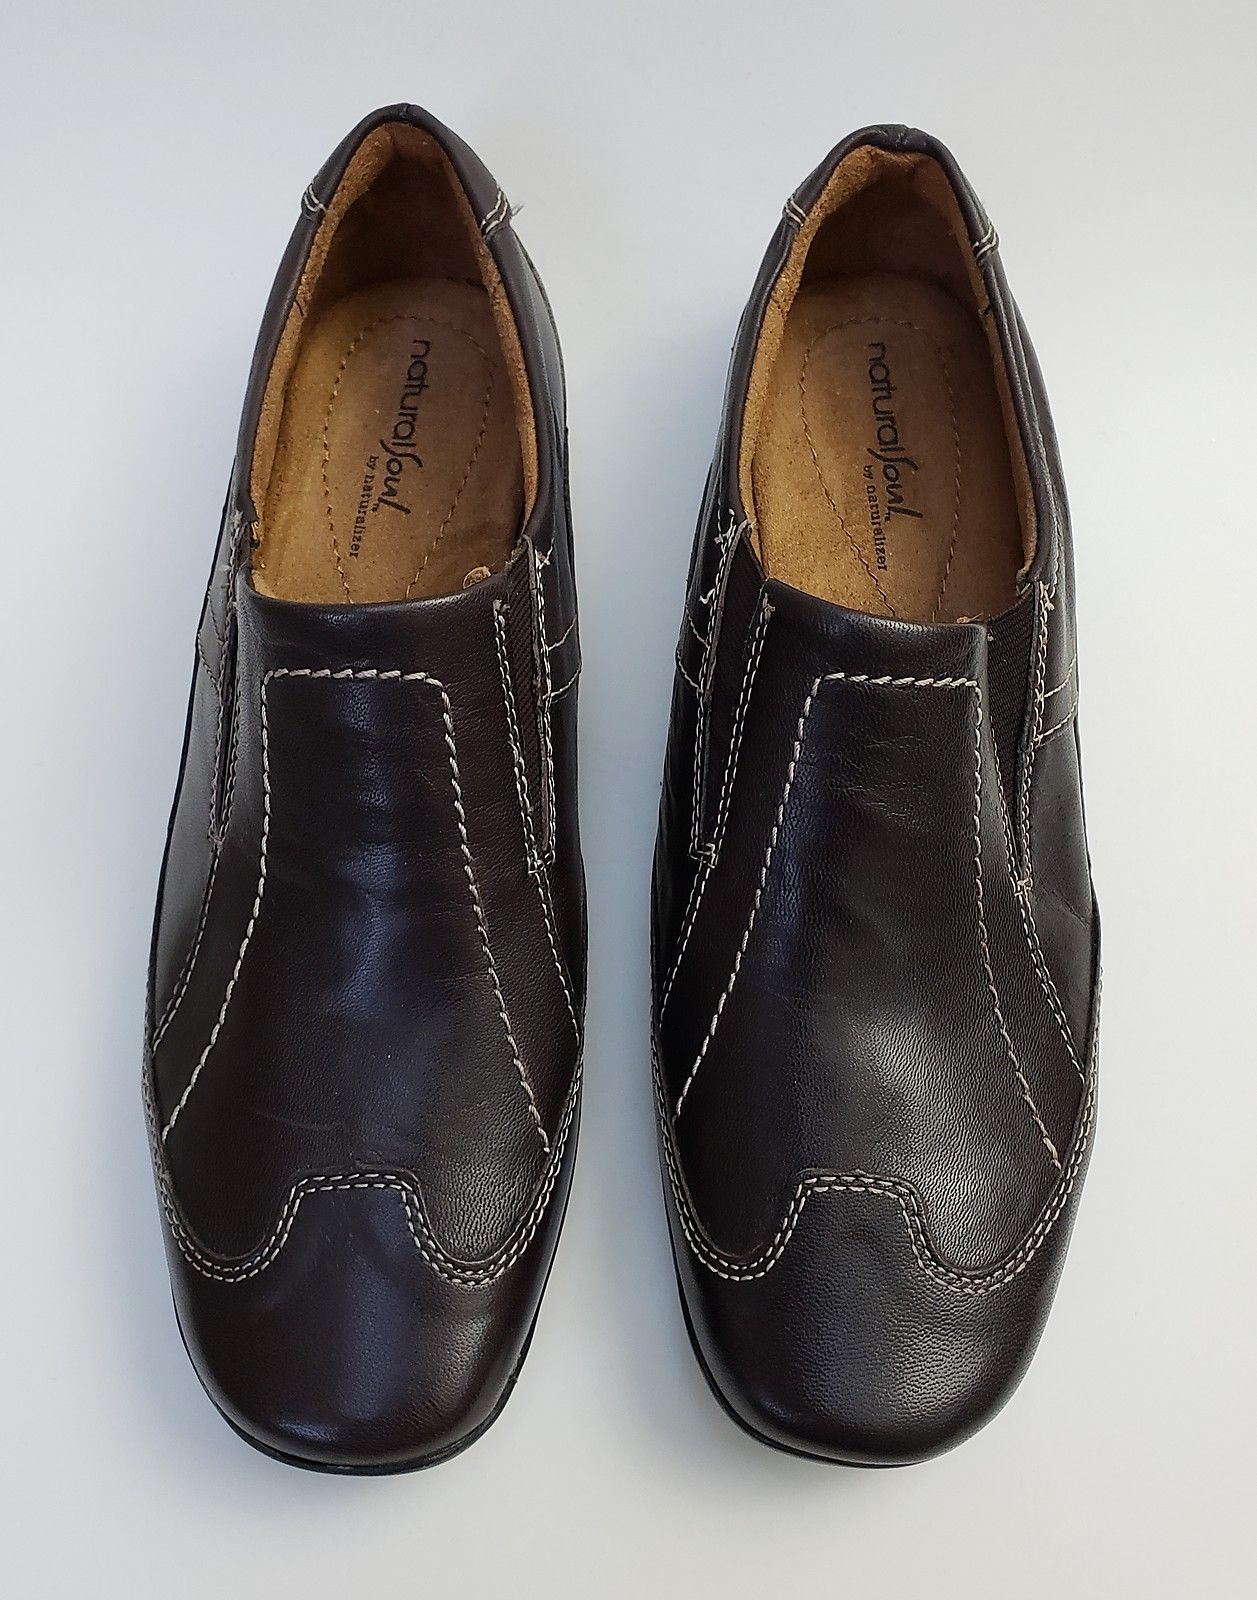 4421b544c0d3 Natural Soul Naturalizer Shoes Flats Brown Slip On Flor Womens Size 9 M